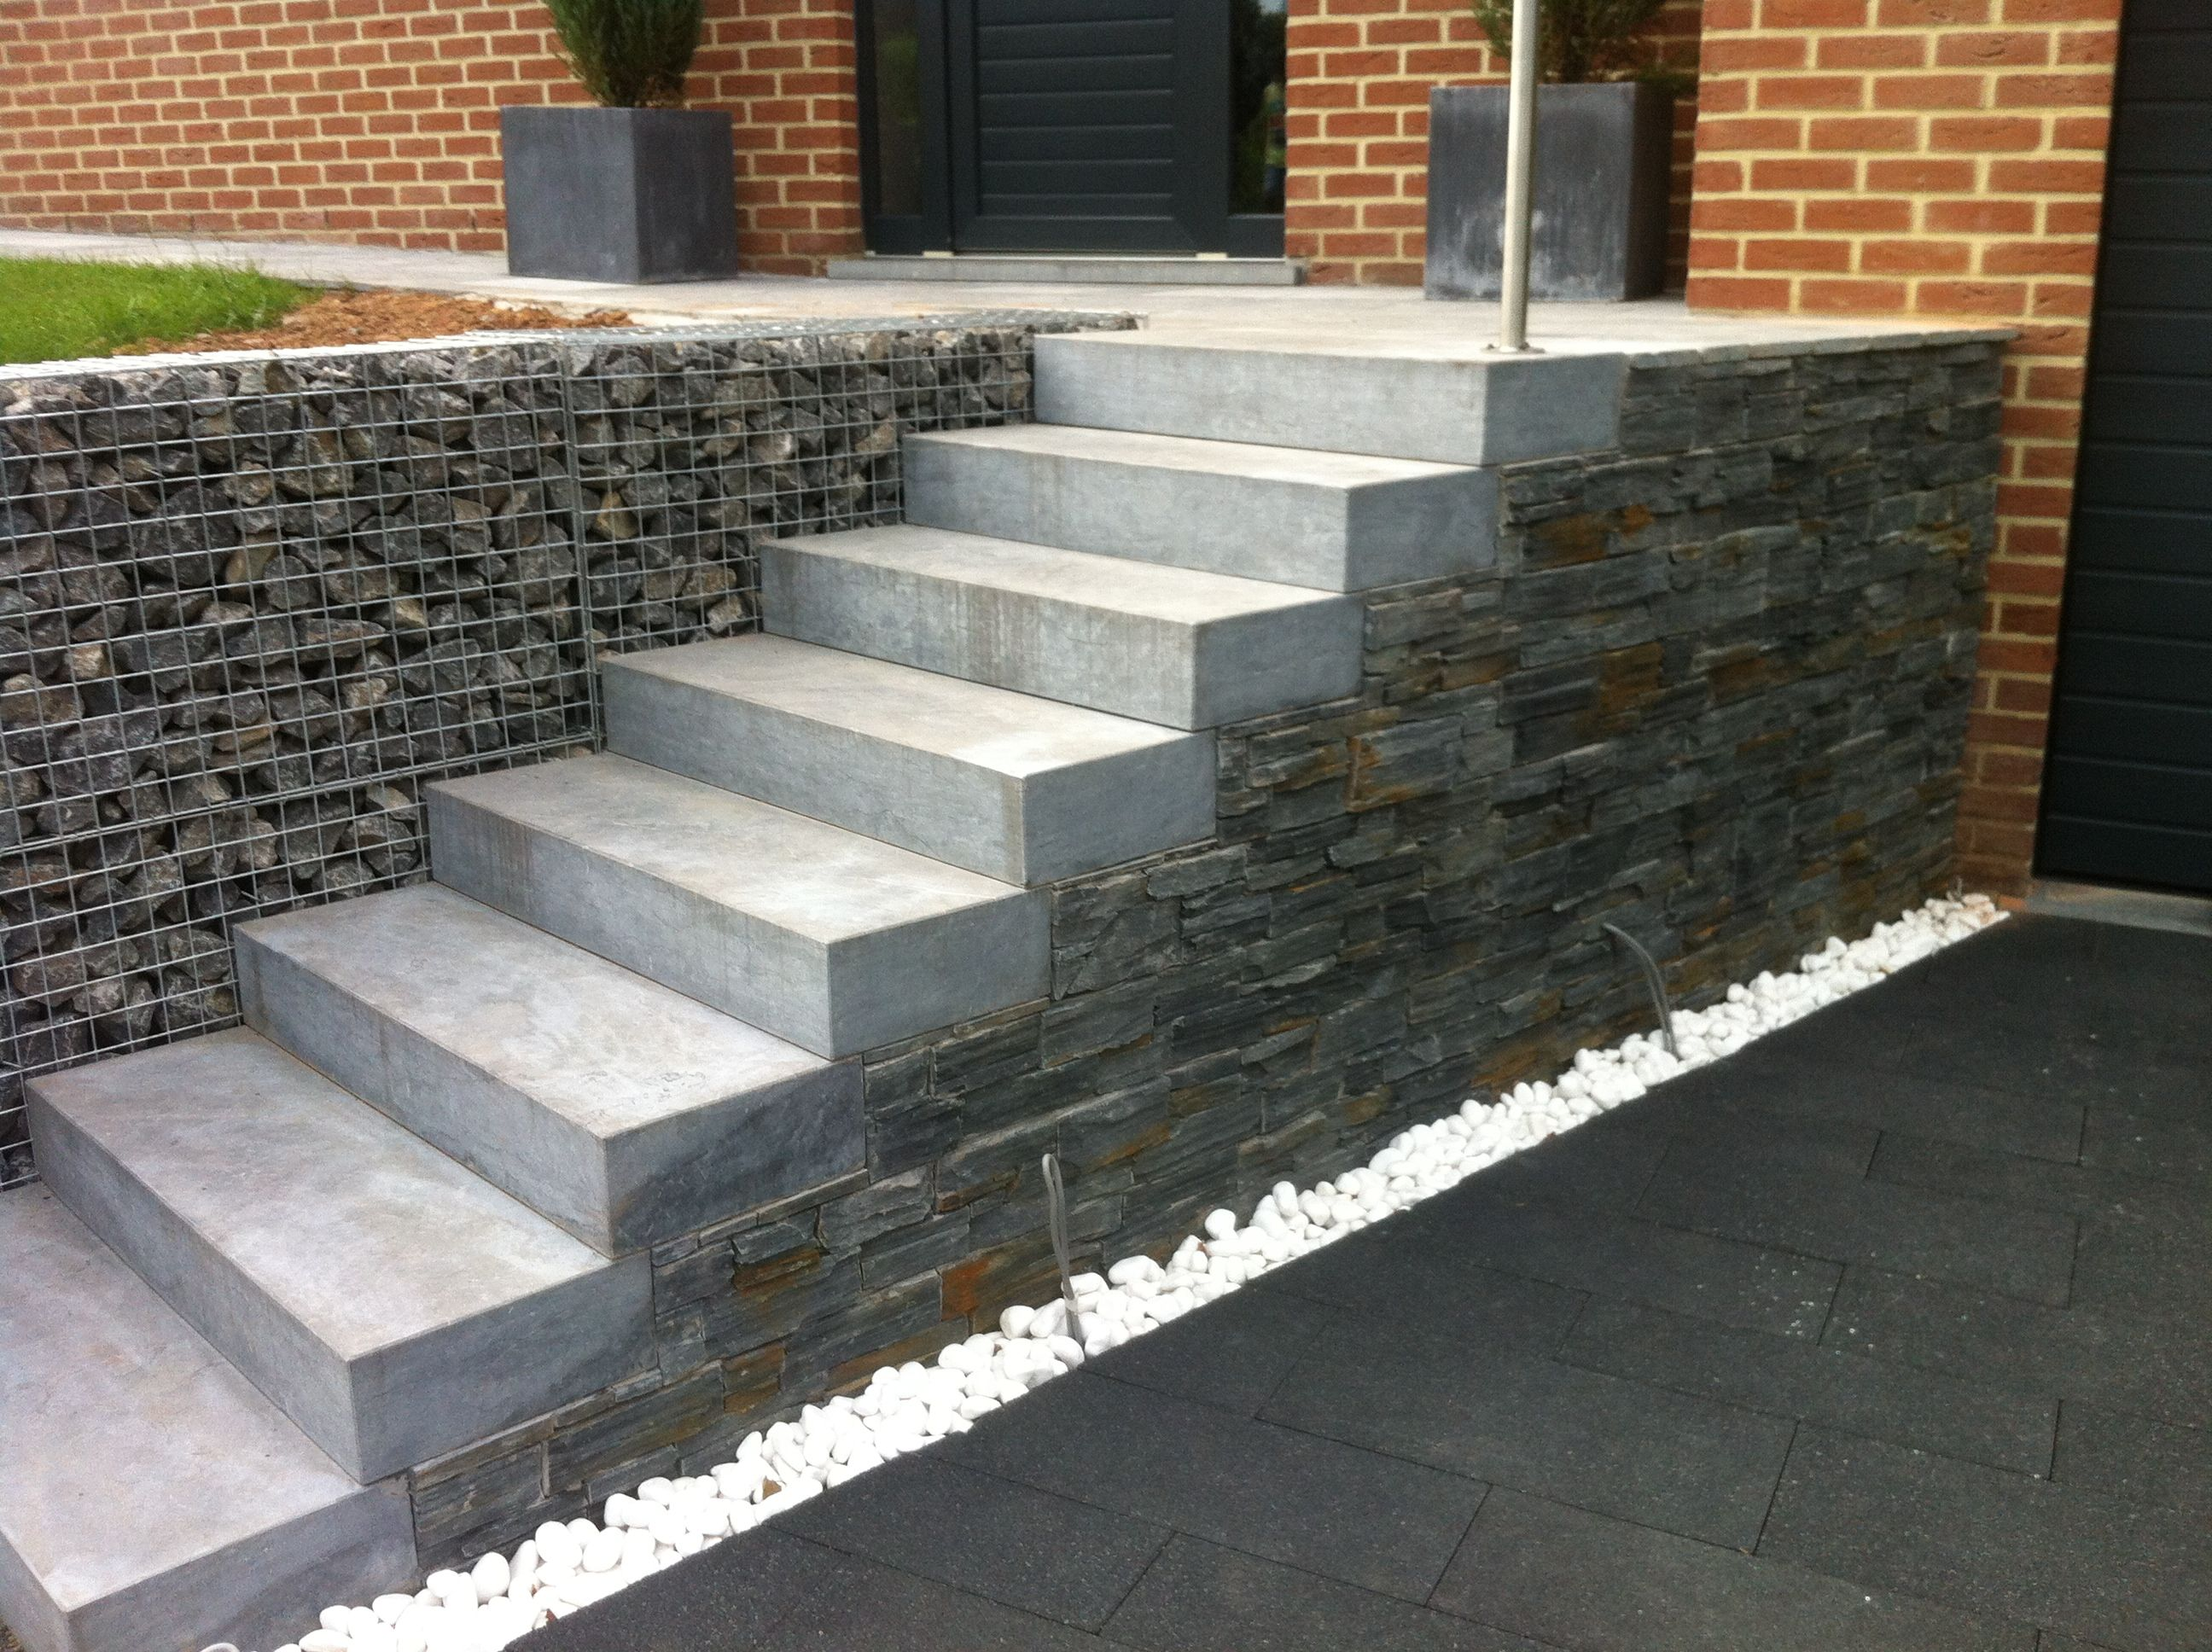 escalier pierre bleue plaquette step ladder pinterest. Black Bedroom Furniture Sets. Home Design Ideas